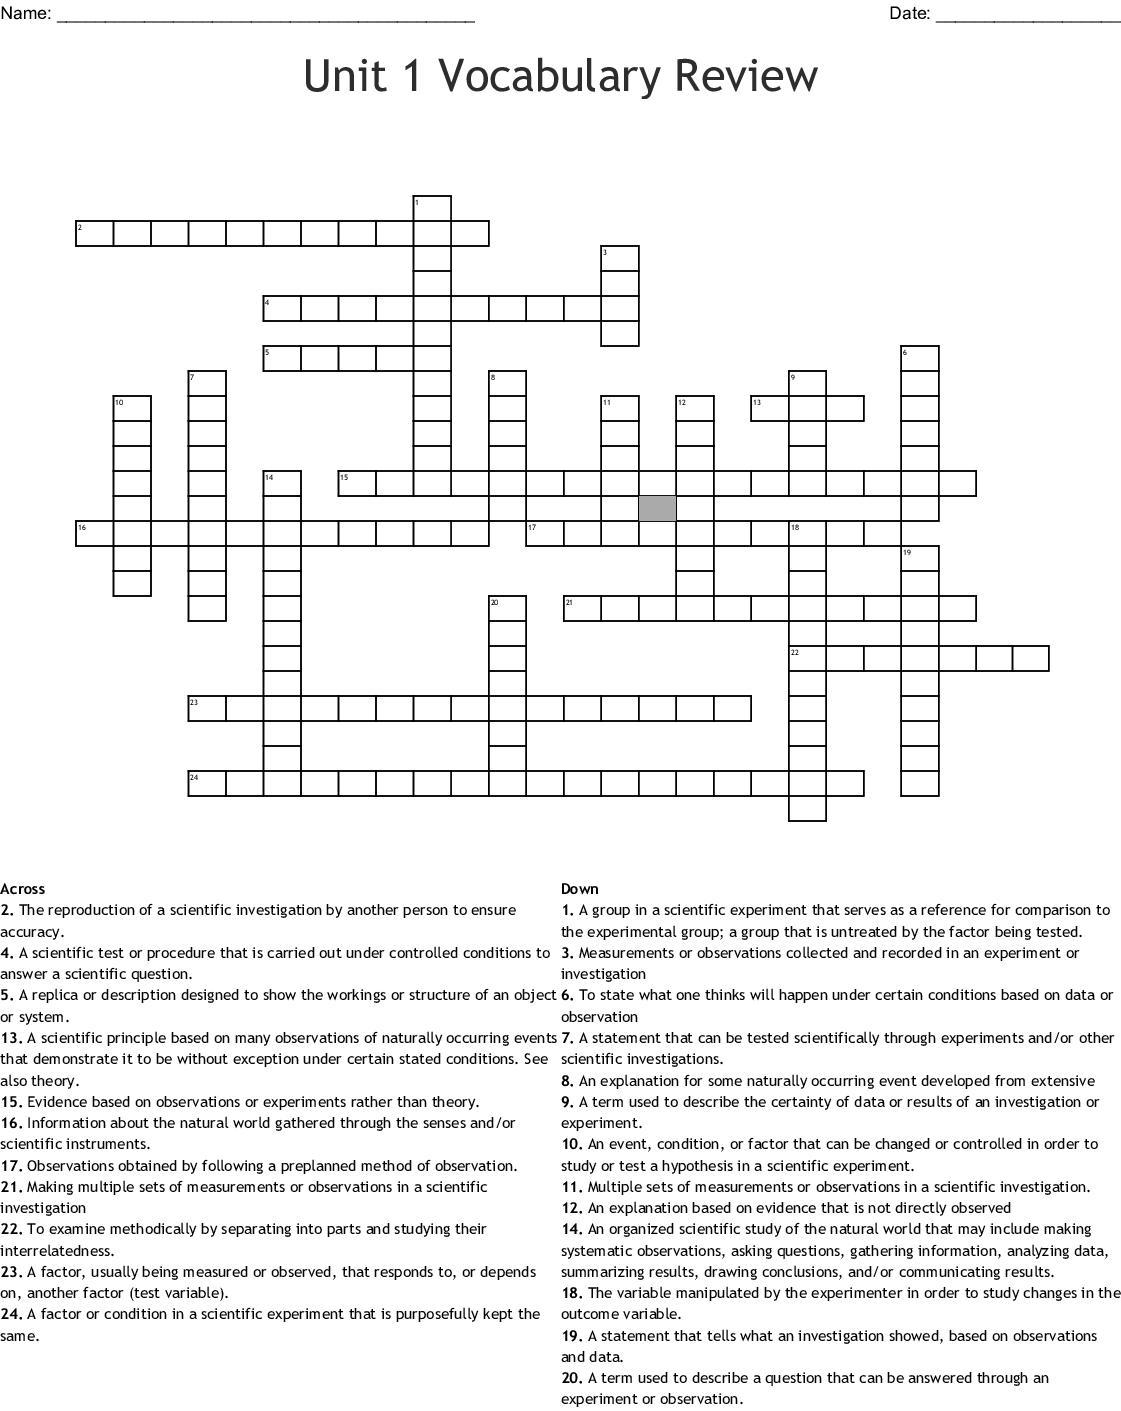 Experimental Design Worksheet Scientific Method Answer Key